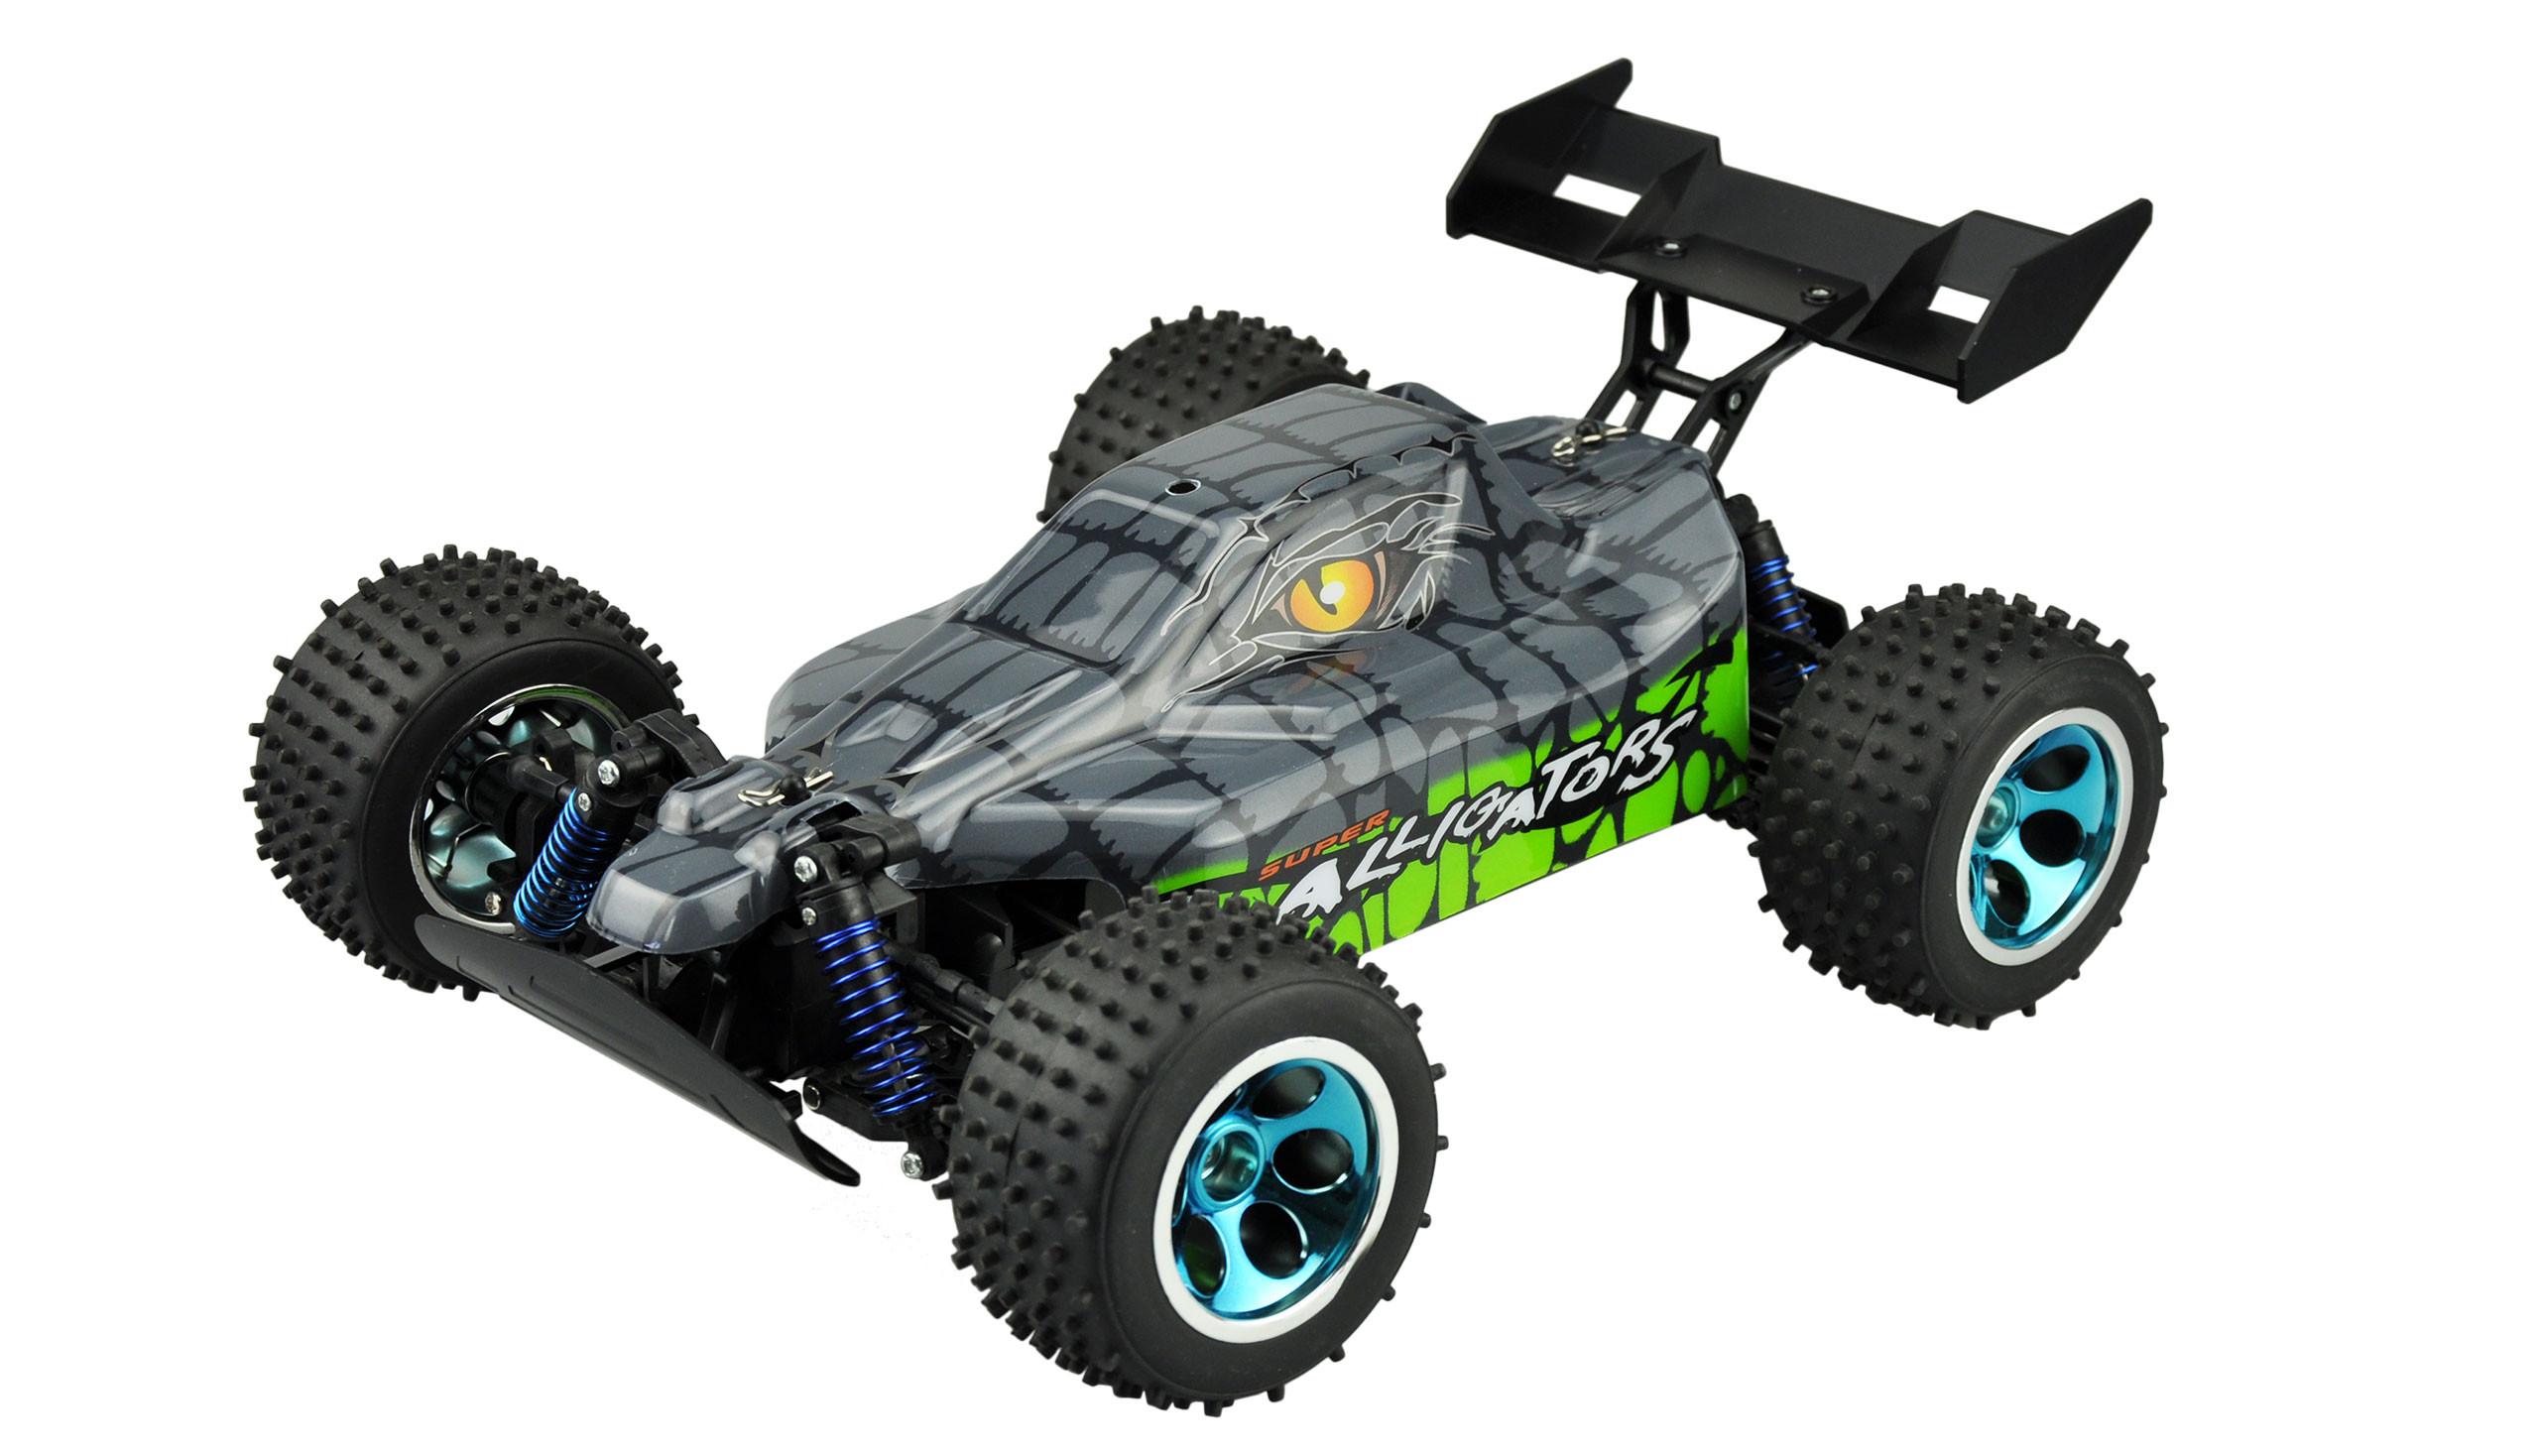 Amewi 22178 - Buggy - Elektromotor - 1:12 - Betriebsbereit (RTR) - Multi - Kunststoff